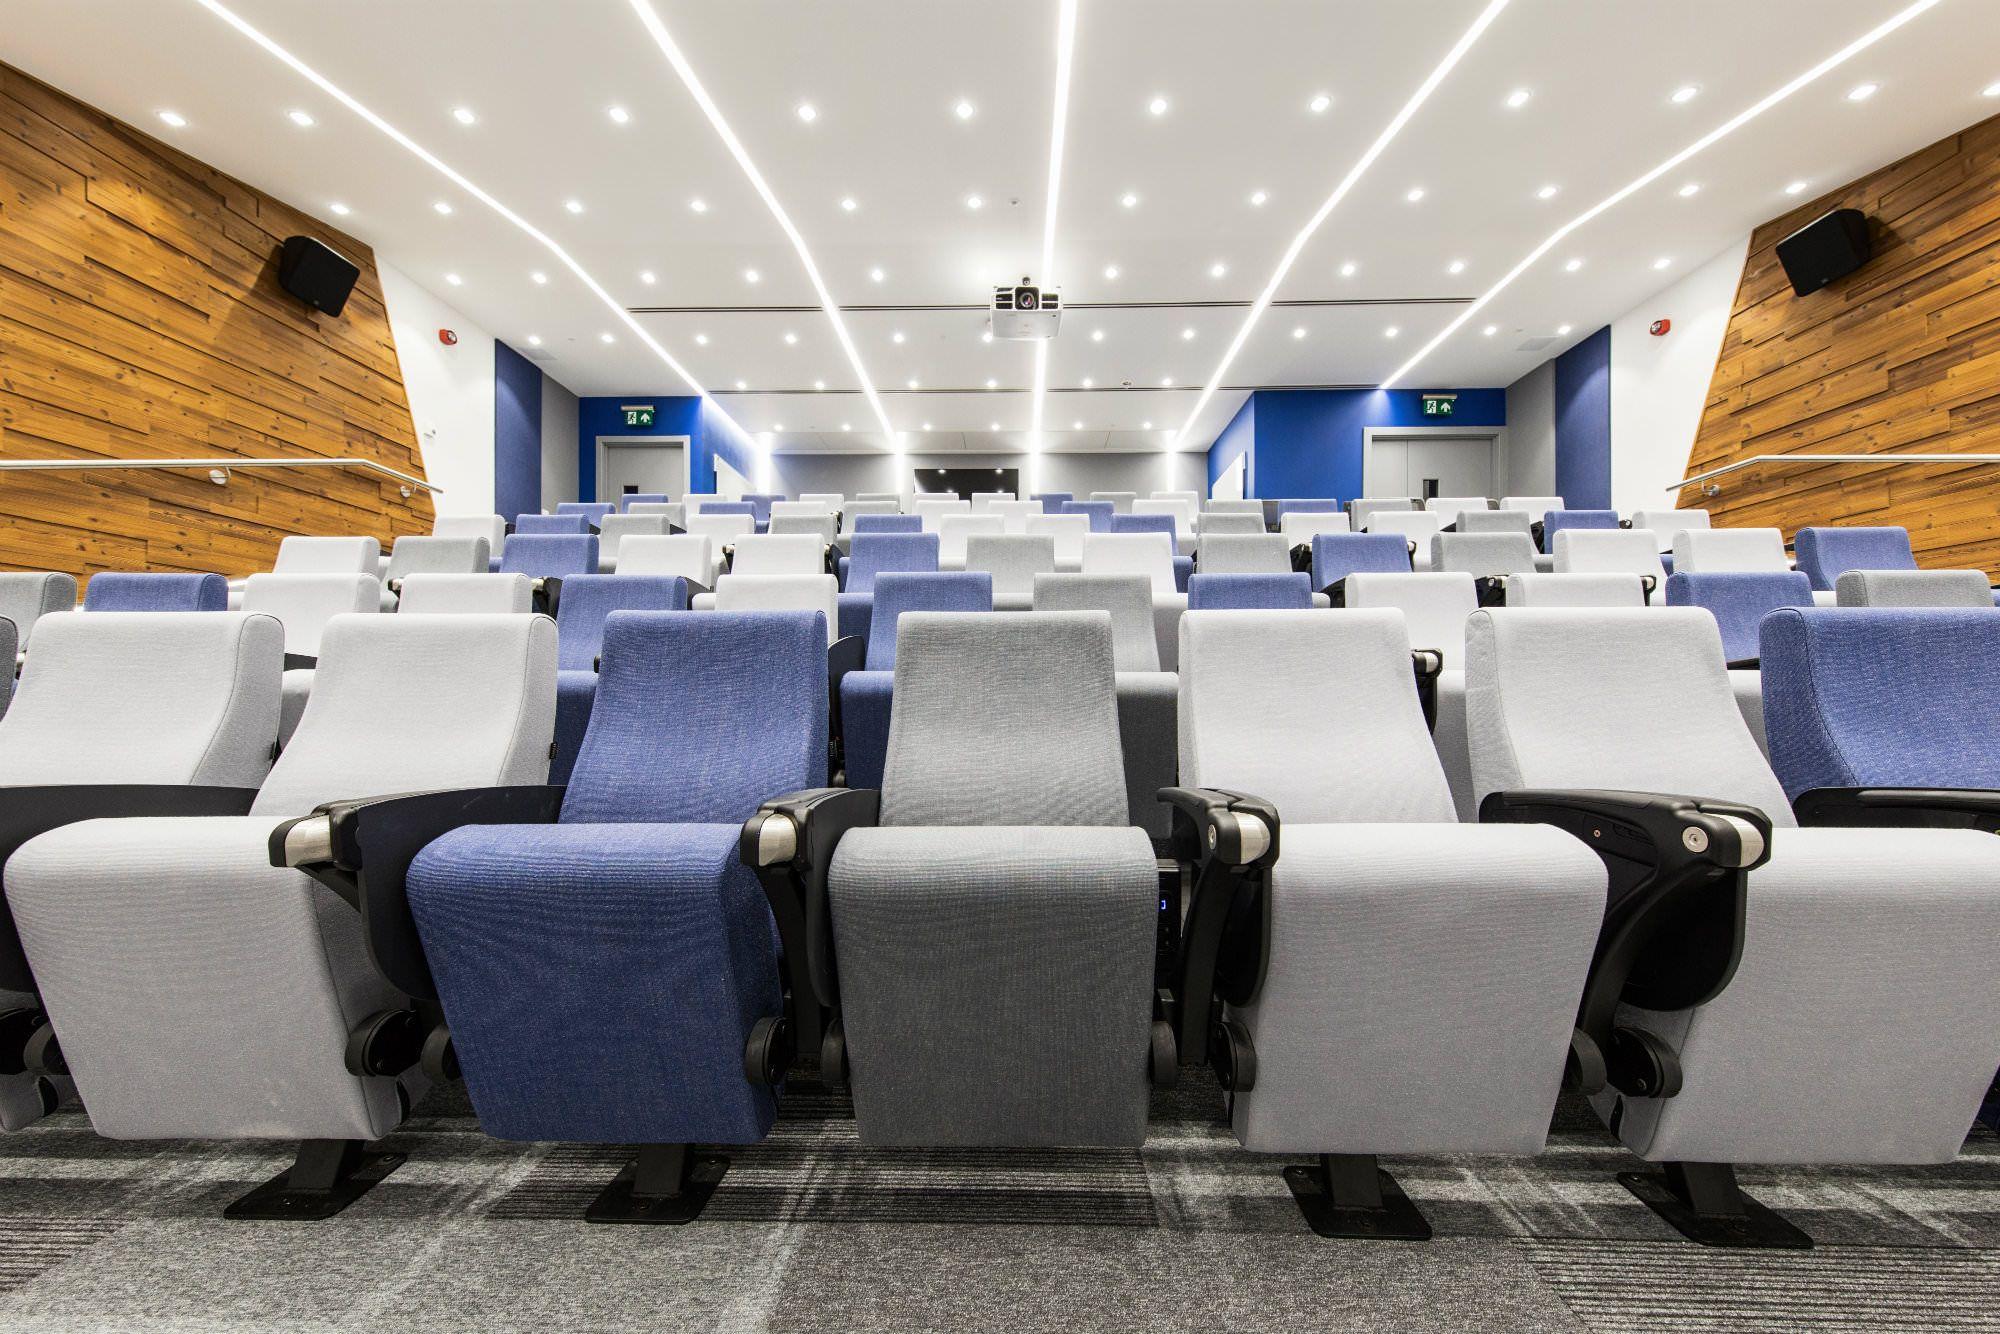 Ferco Seating Systems Ltd